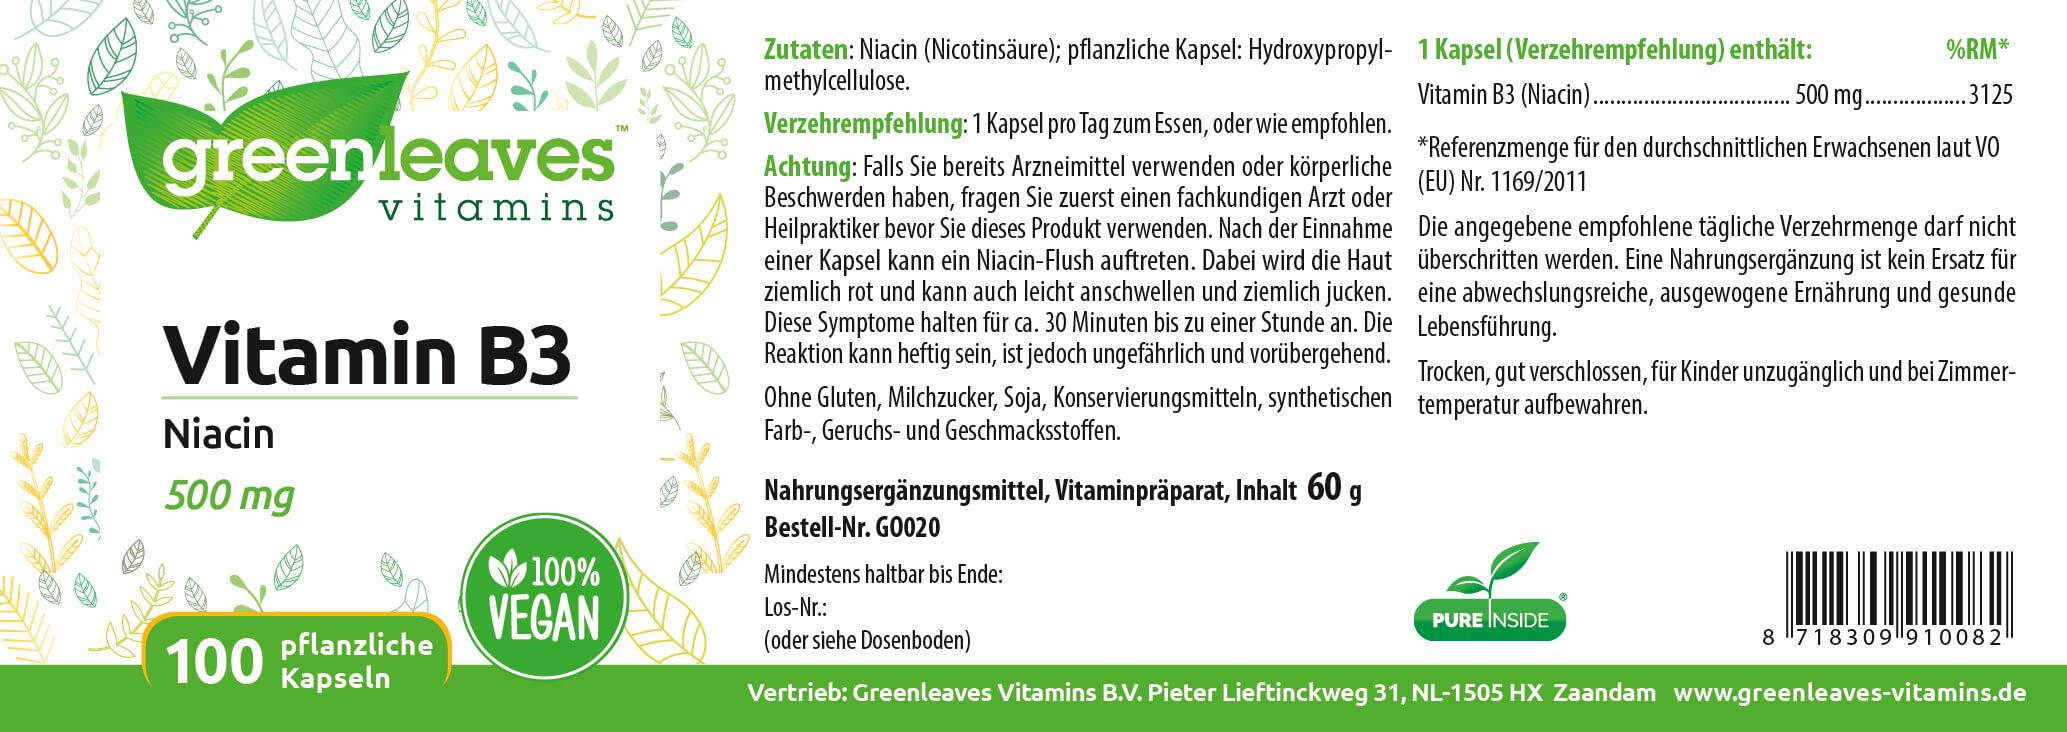 GO020-Vitamin-B3-500mgzvUzNIpMQys5C